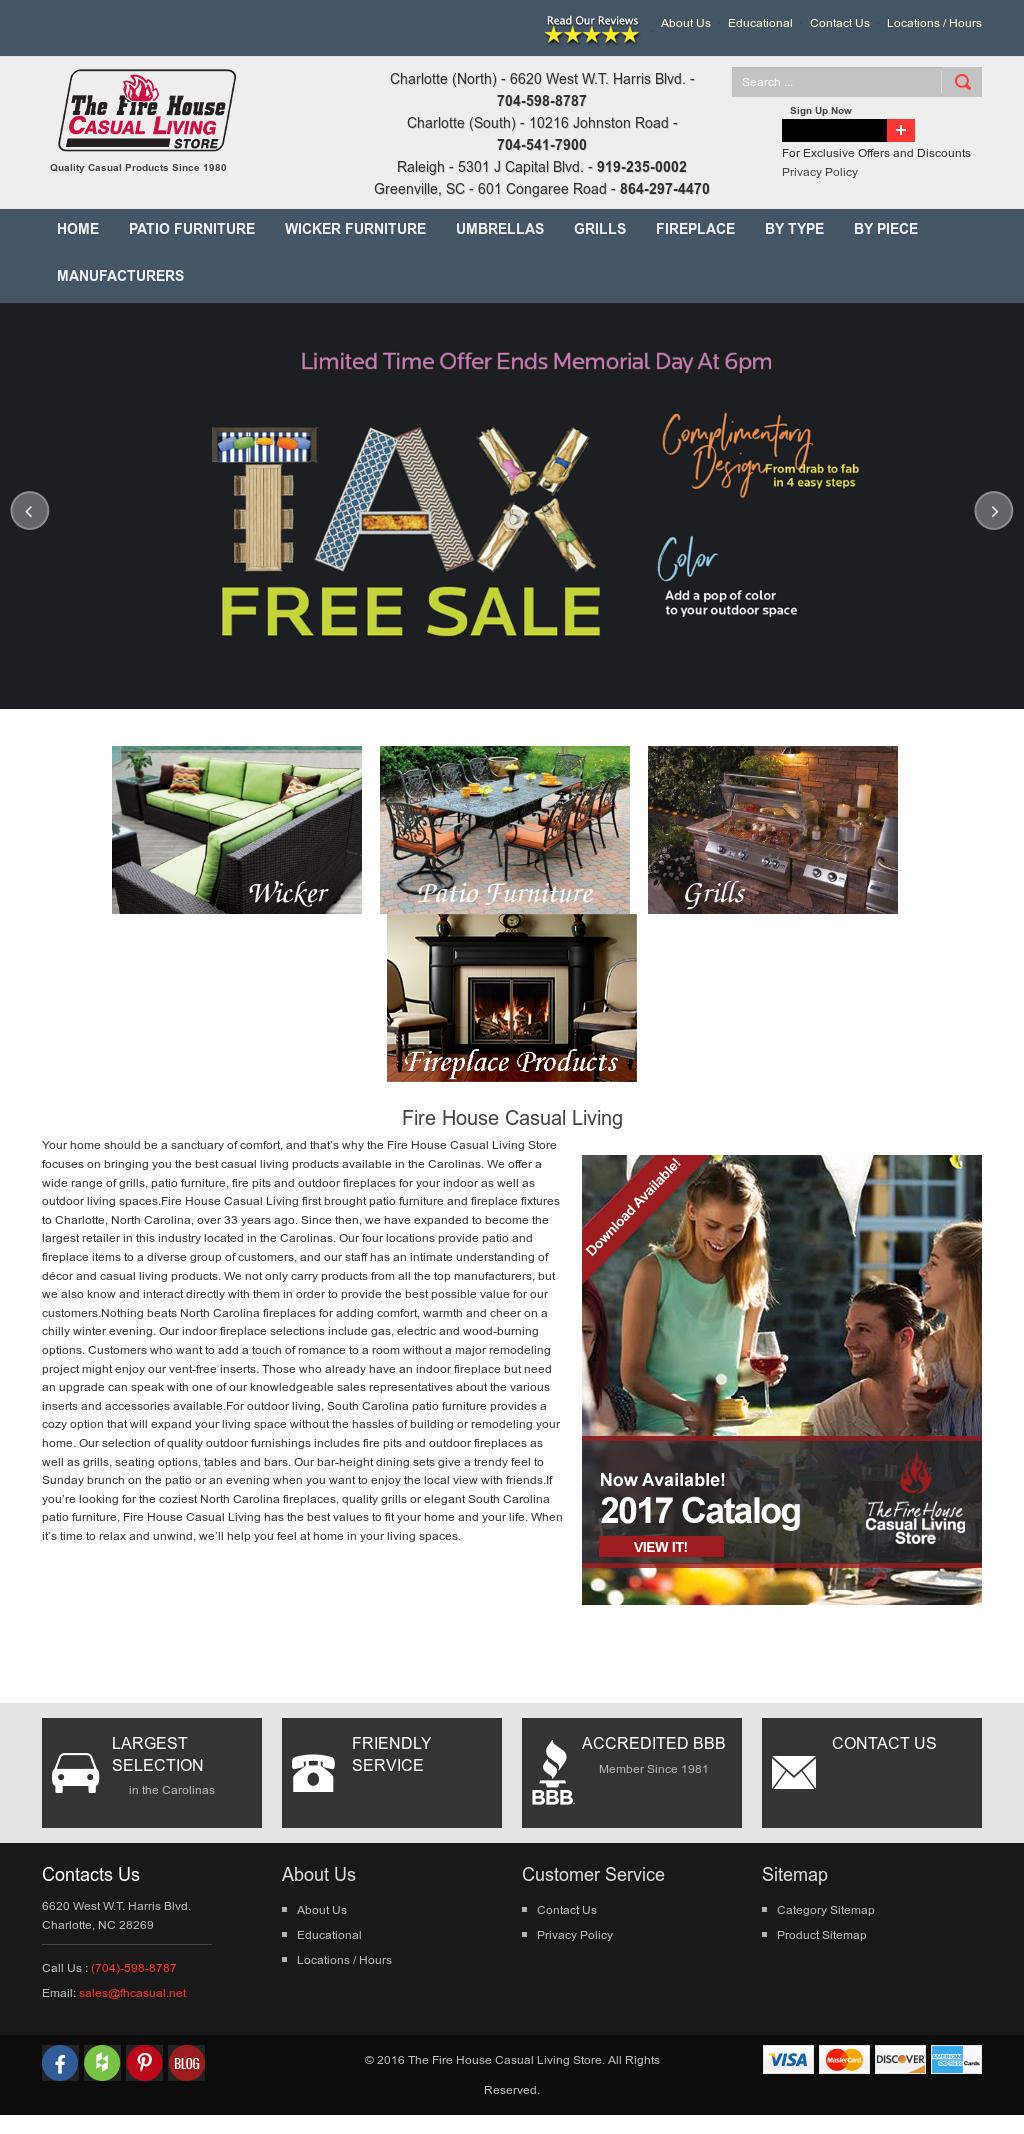 Bon Firehouse Casual Living Store Website History